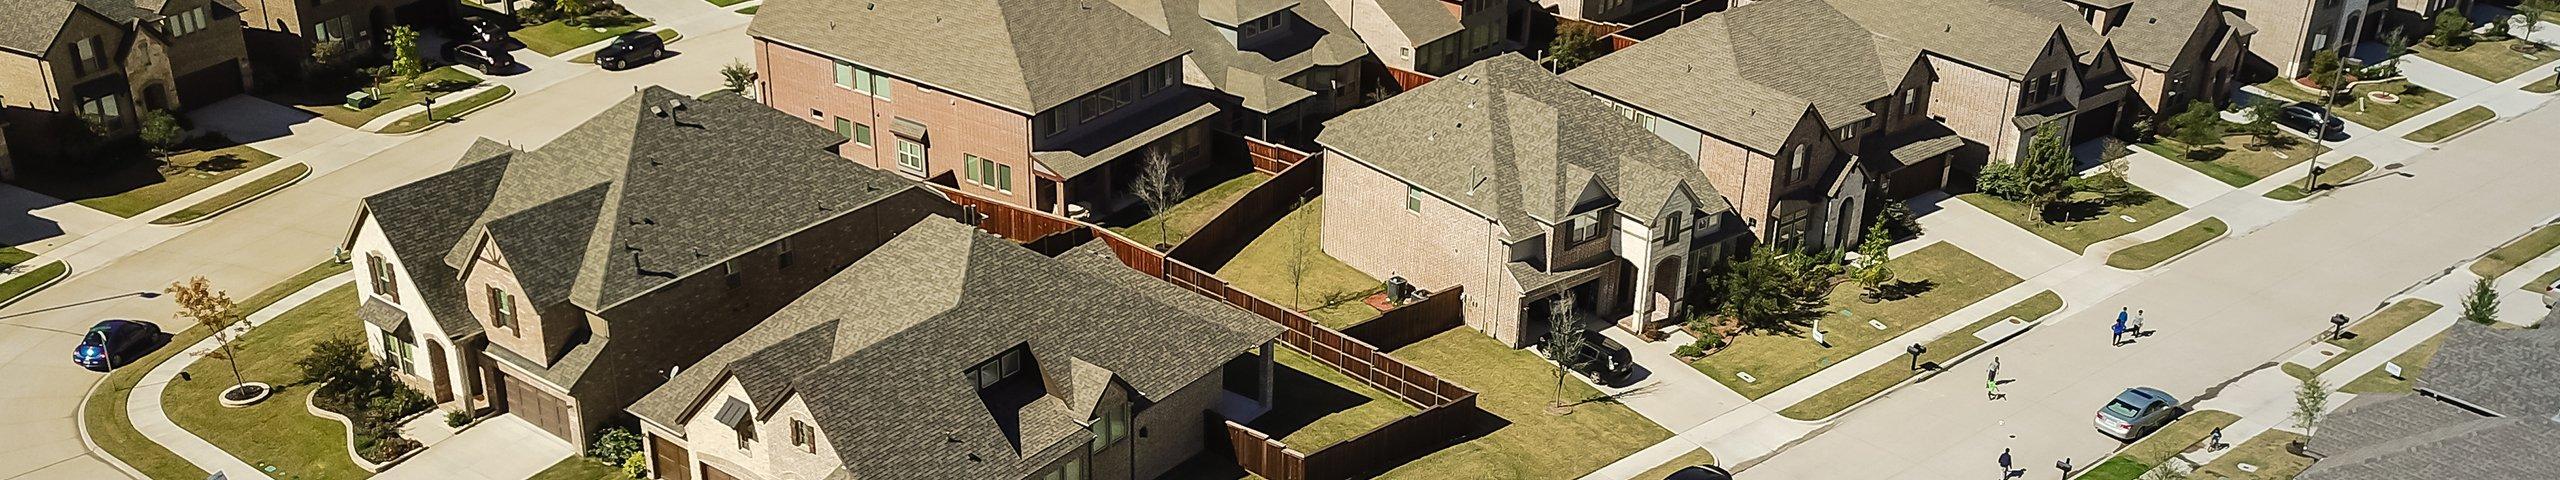 a suburban neighborhood in san antonio texas